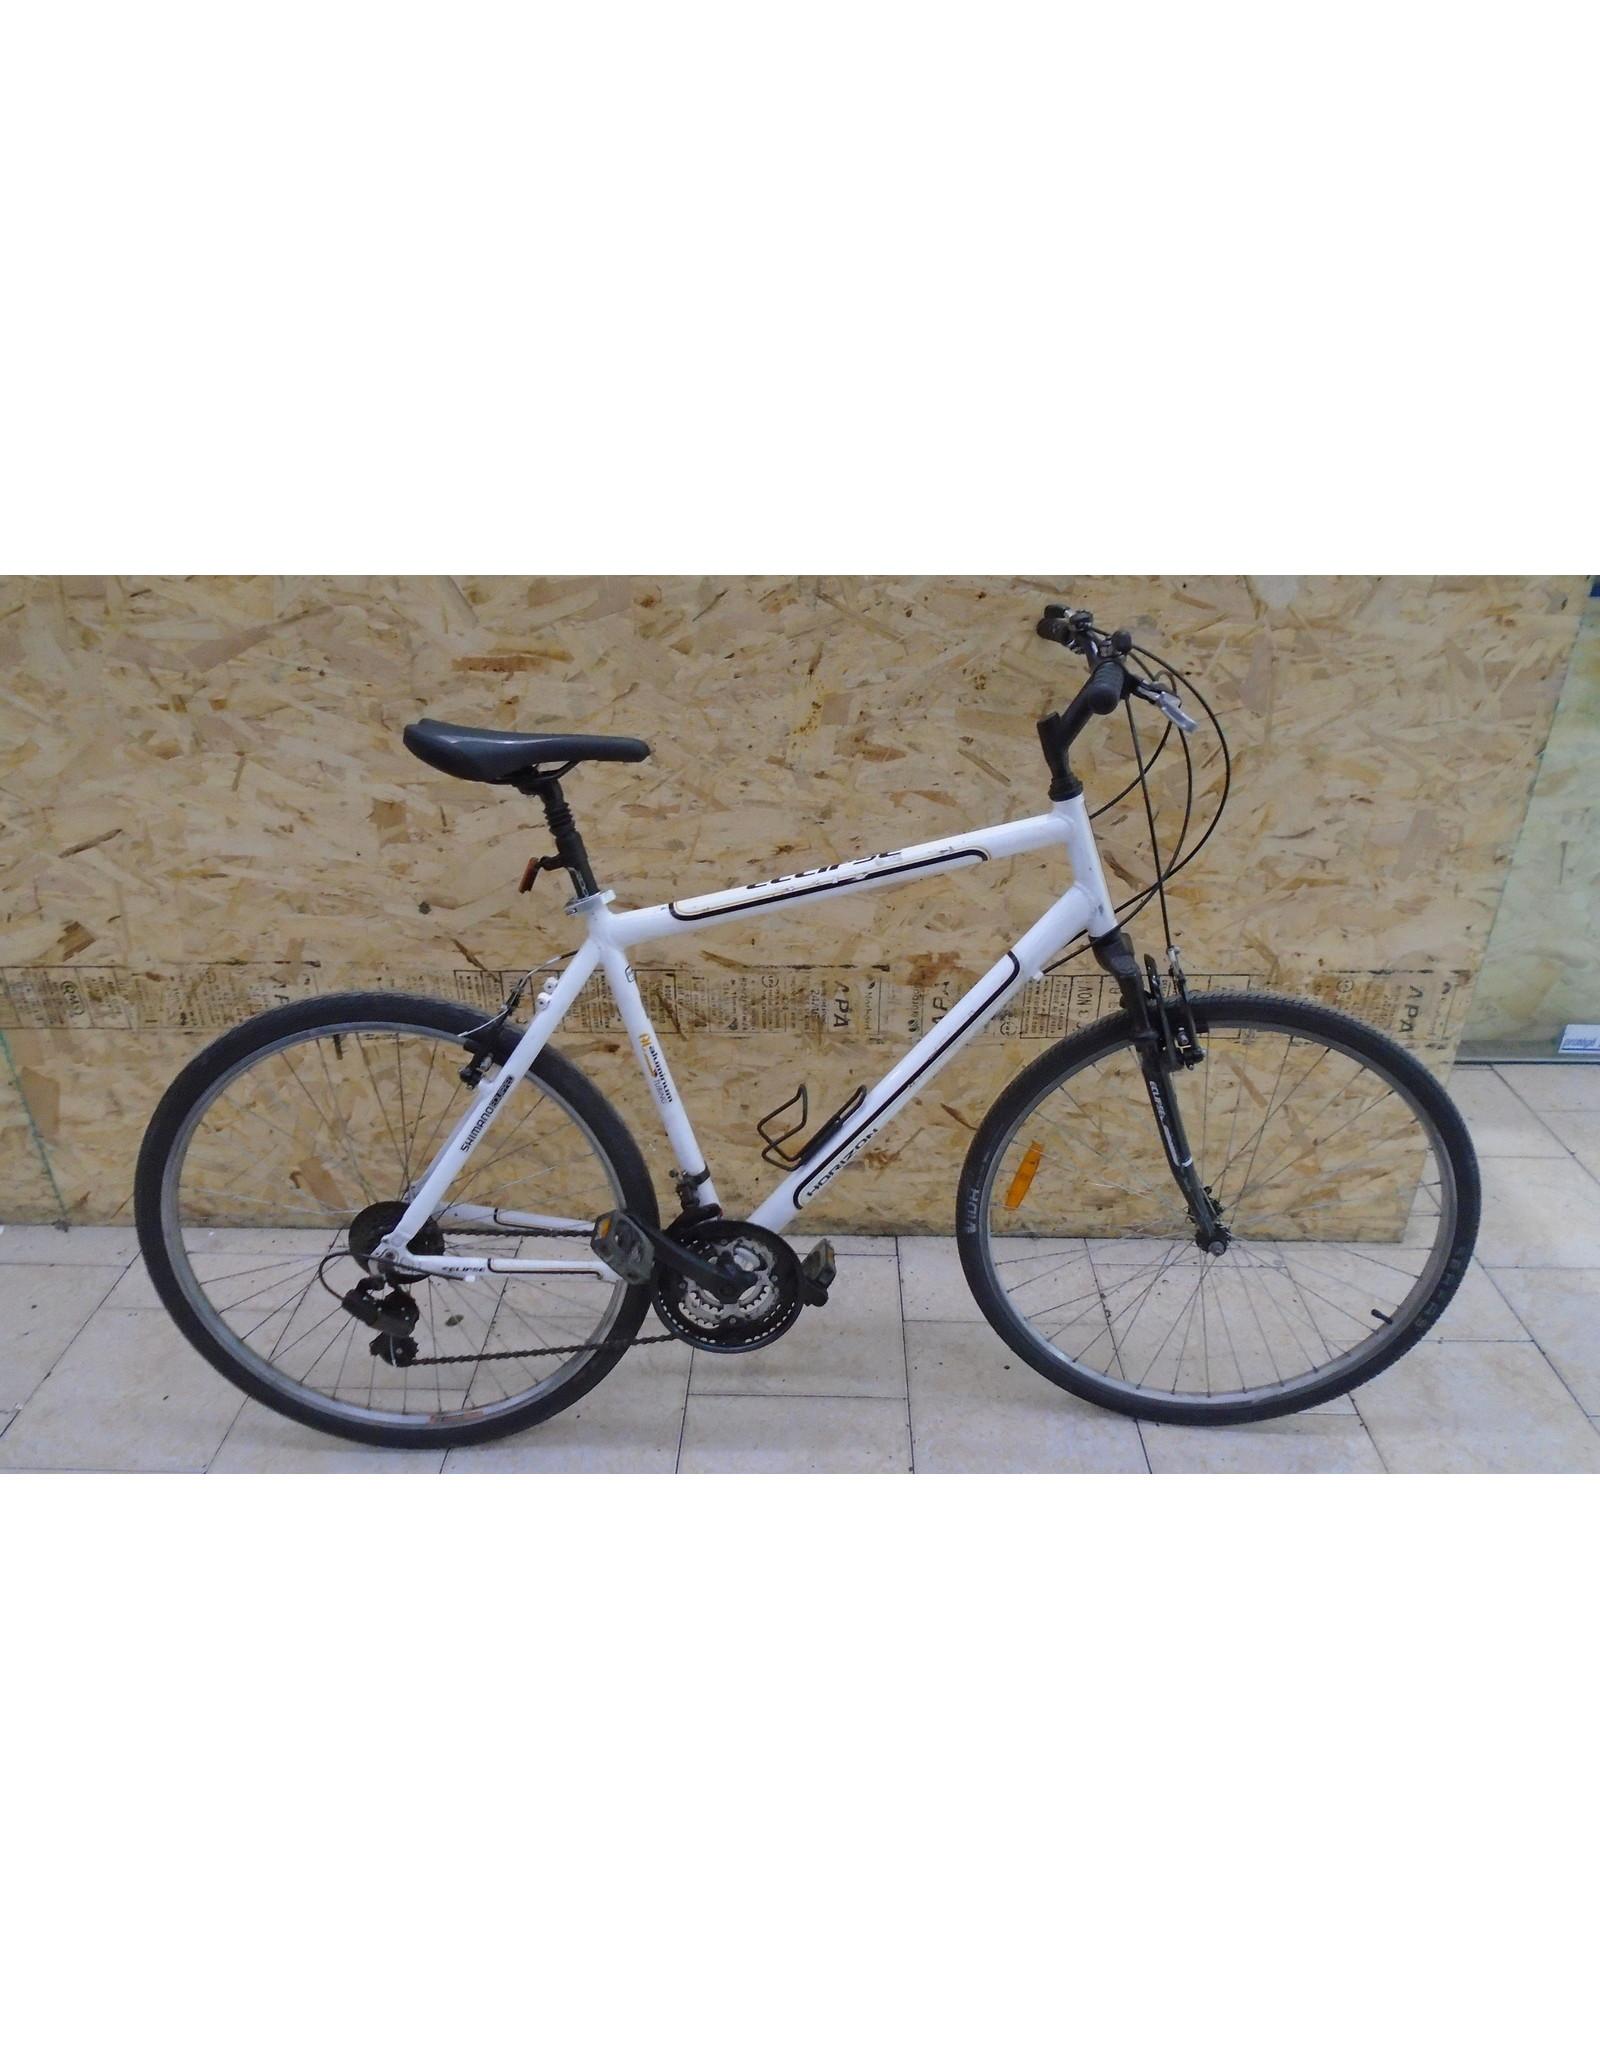 "Vélo usagé hybride Eclipse 22"" - 10719"